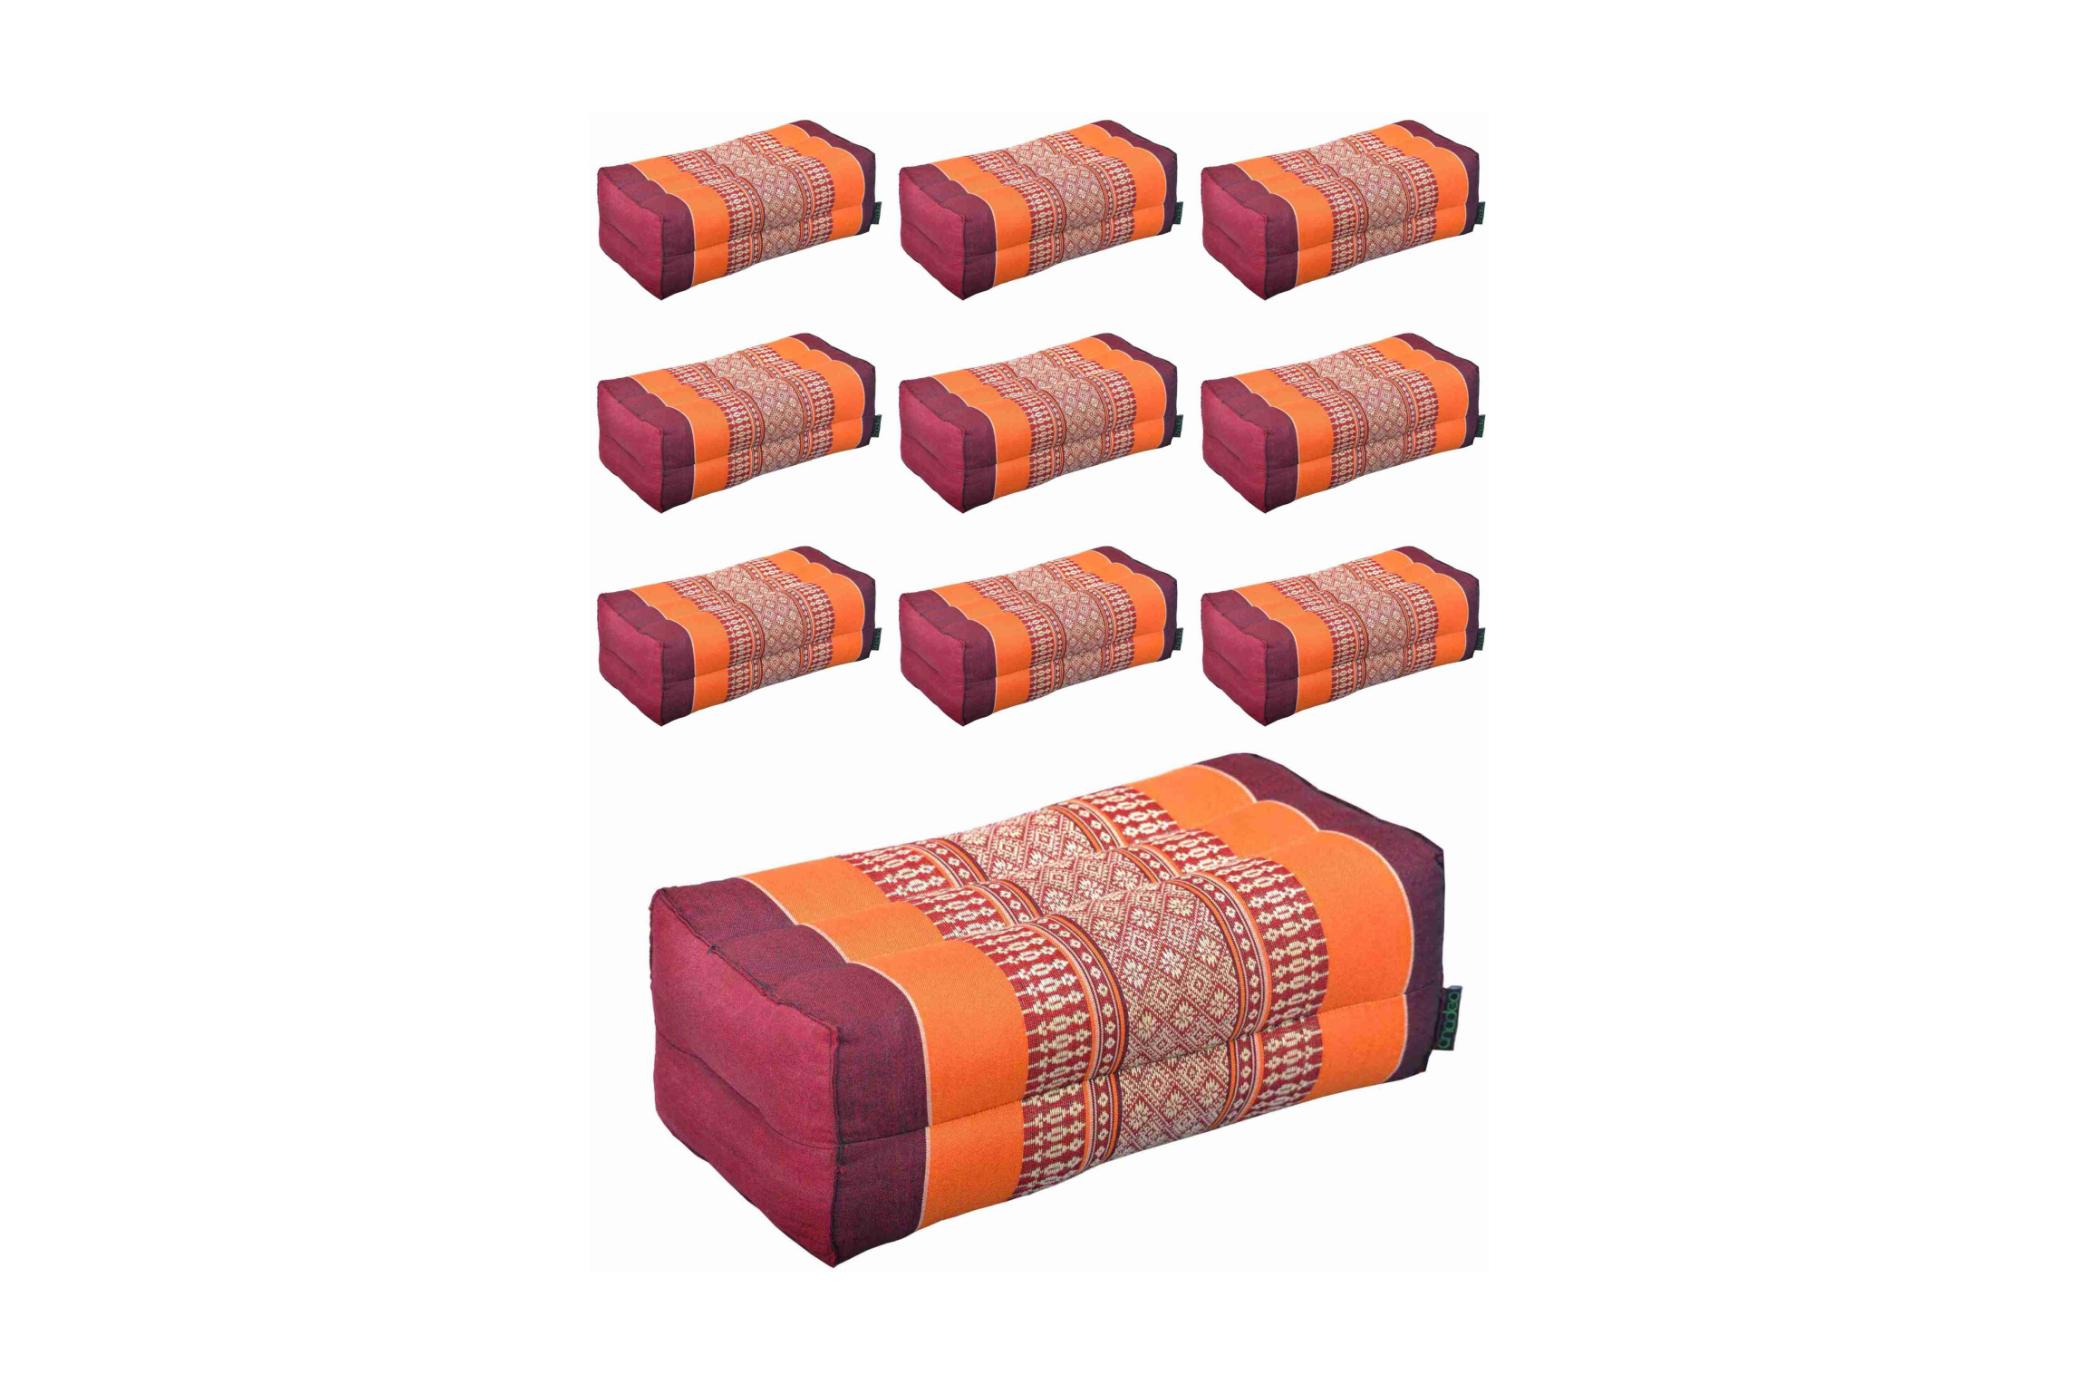 Anadeo Yoga Product - Lot 10 Coussins Burgundy Orange